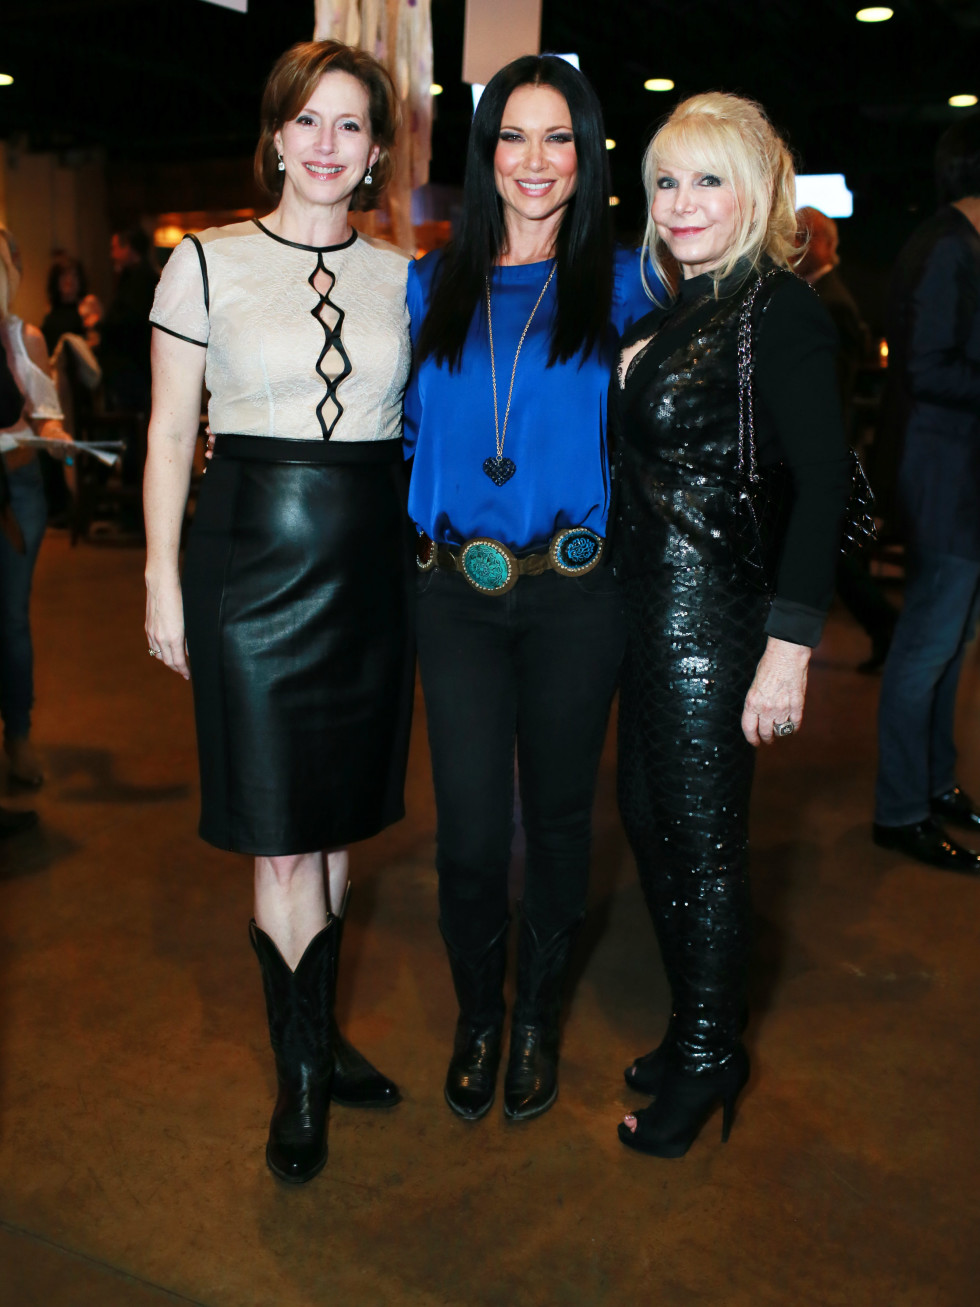 Laura Downing, LeeAnne Locken, Tricia Sims